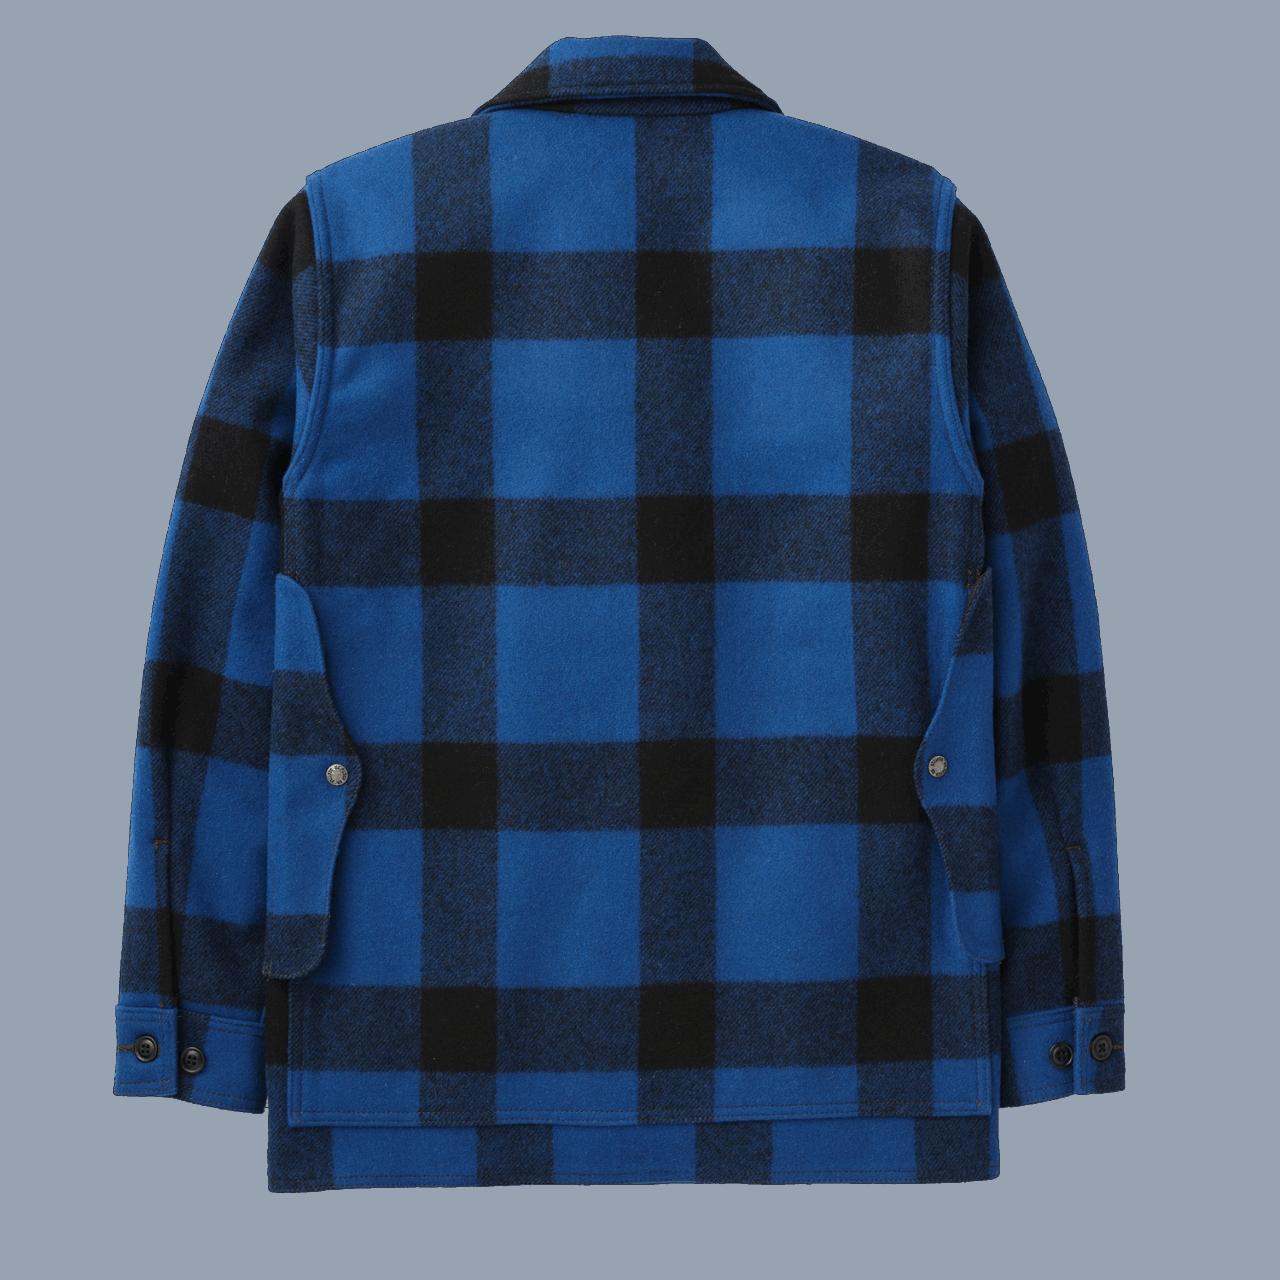 Filson Mackinaw Cruiser - cobalt blue /black